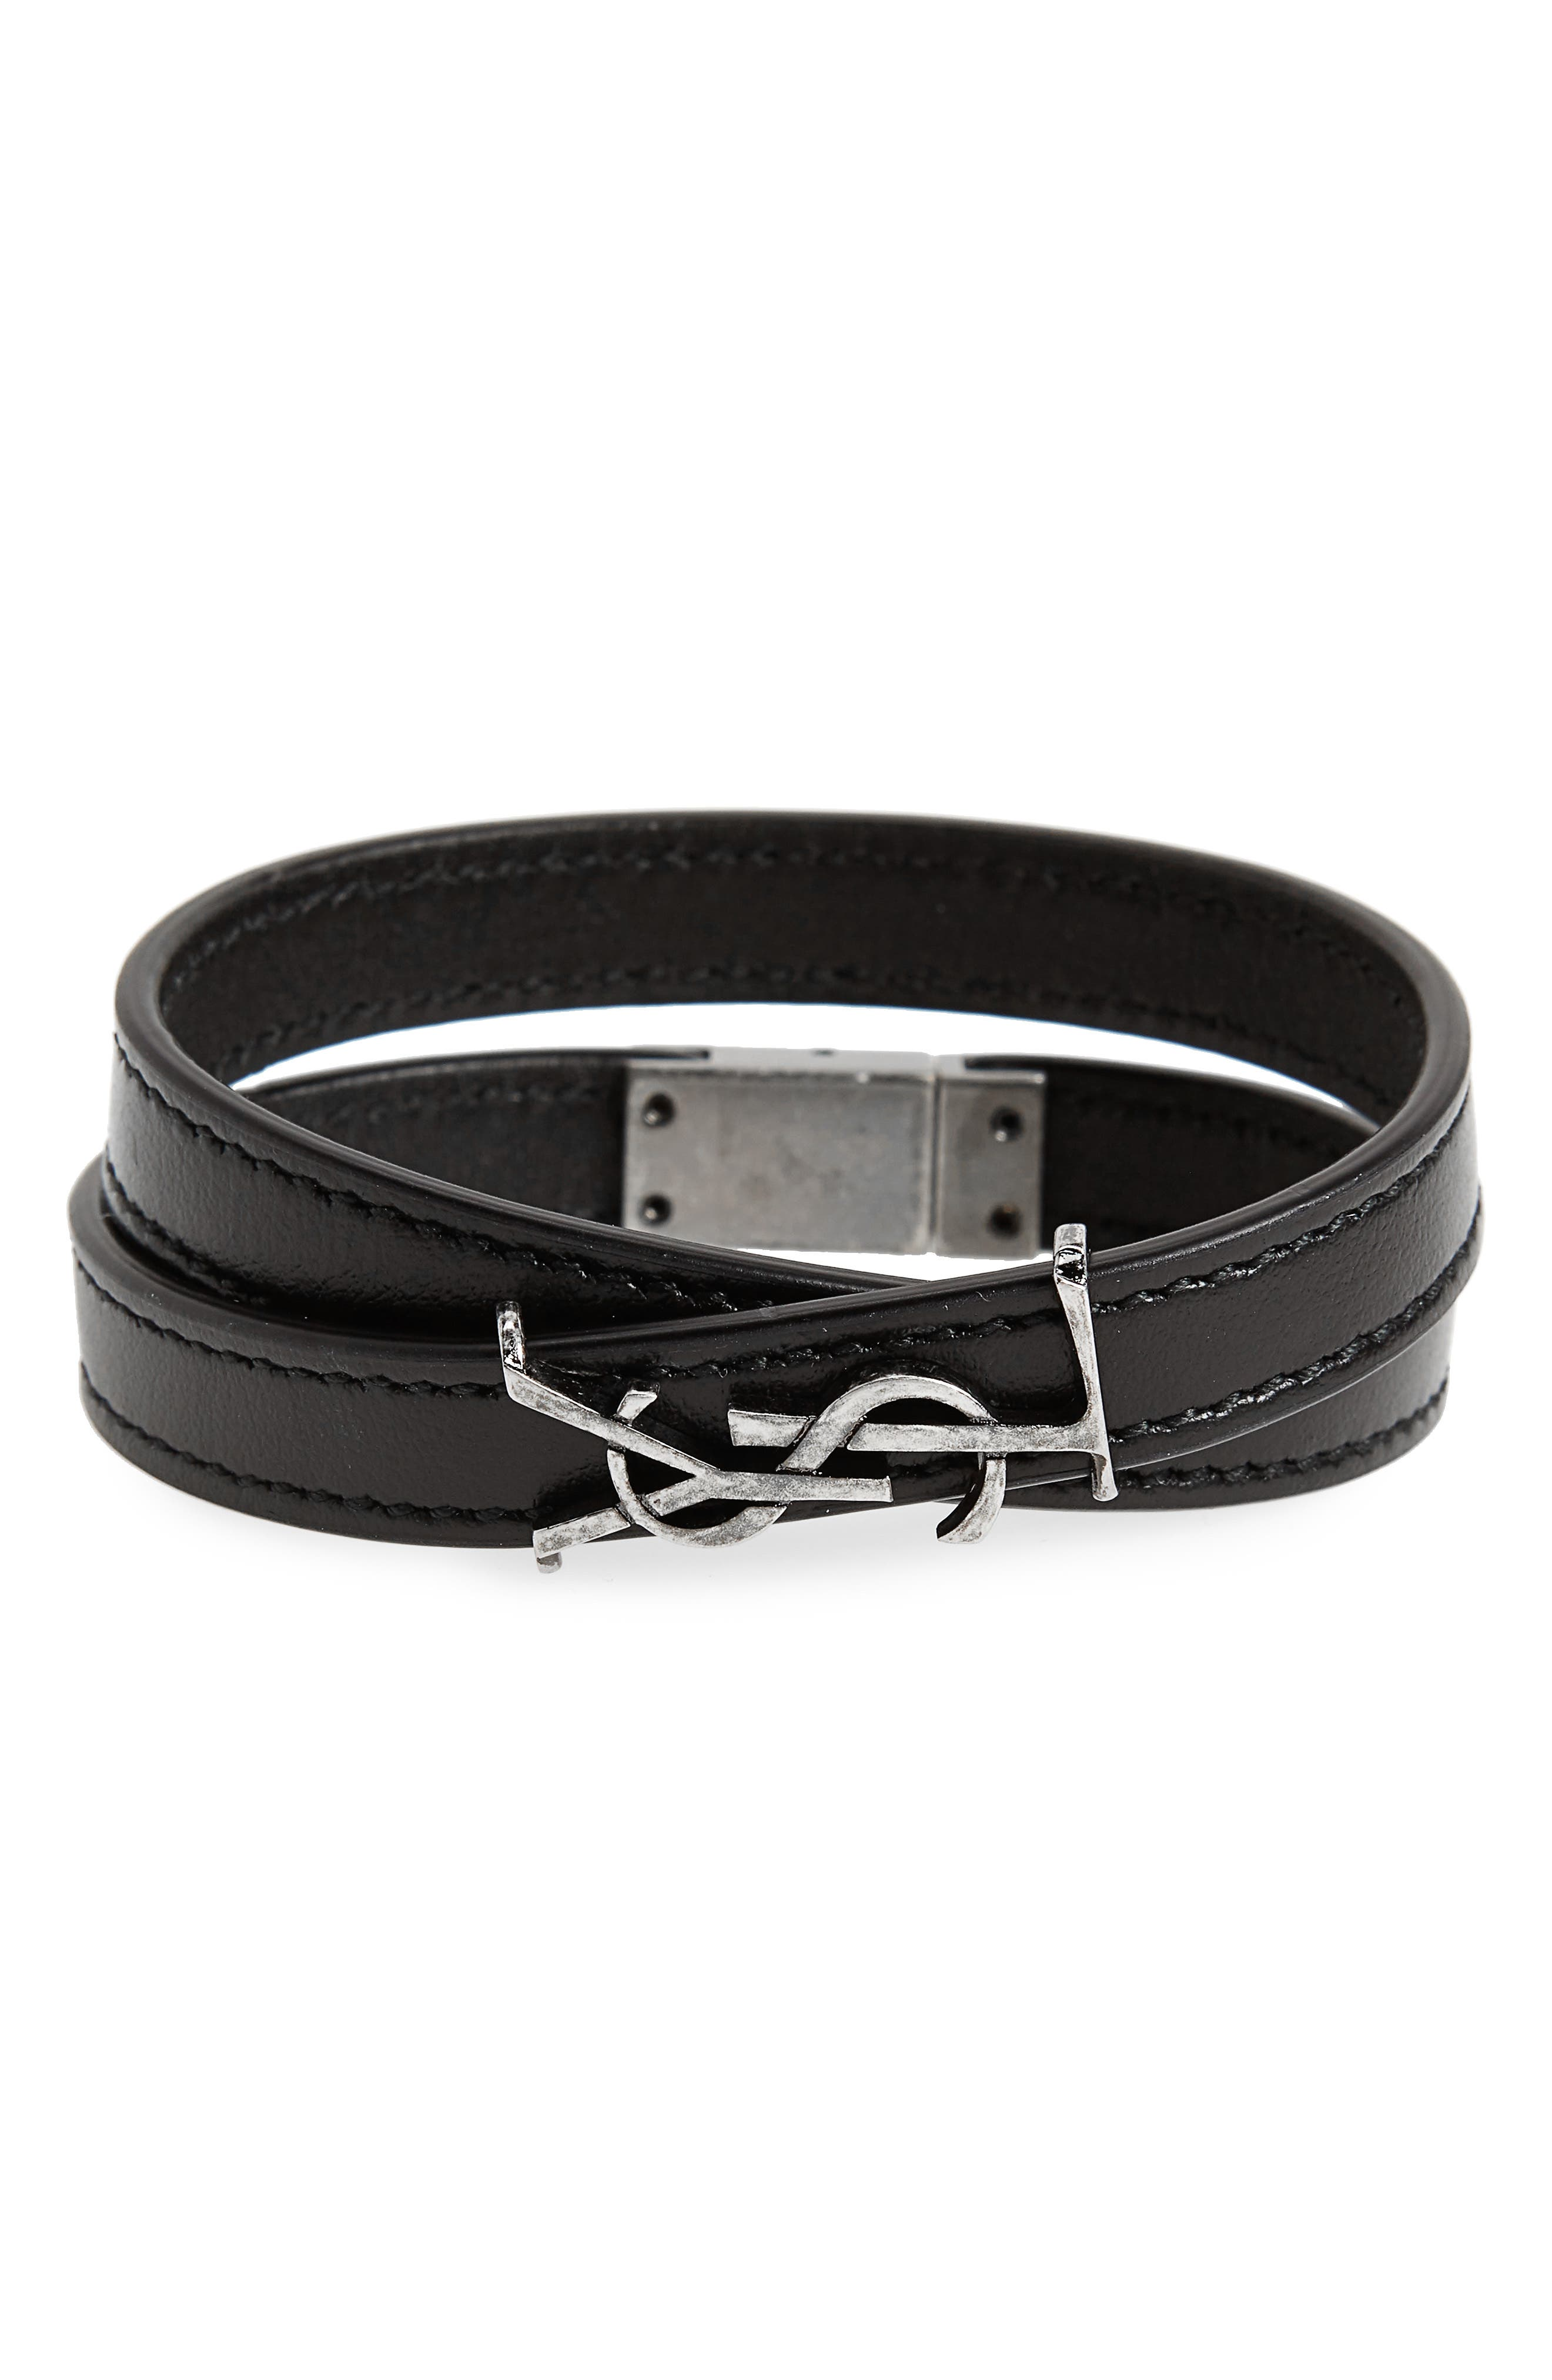 YSL Leather Bracelet,                             Main thumbnail 1, color,                             Nero